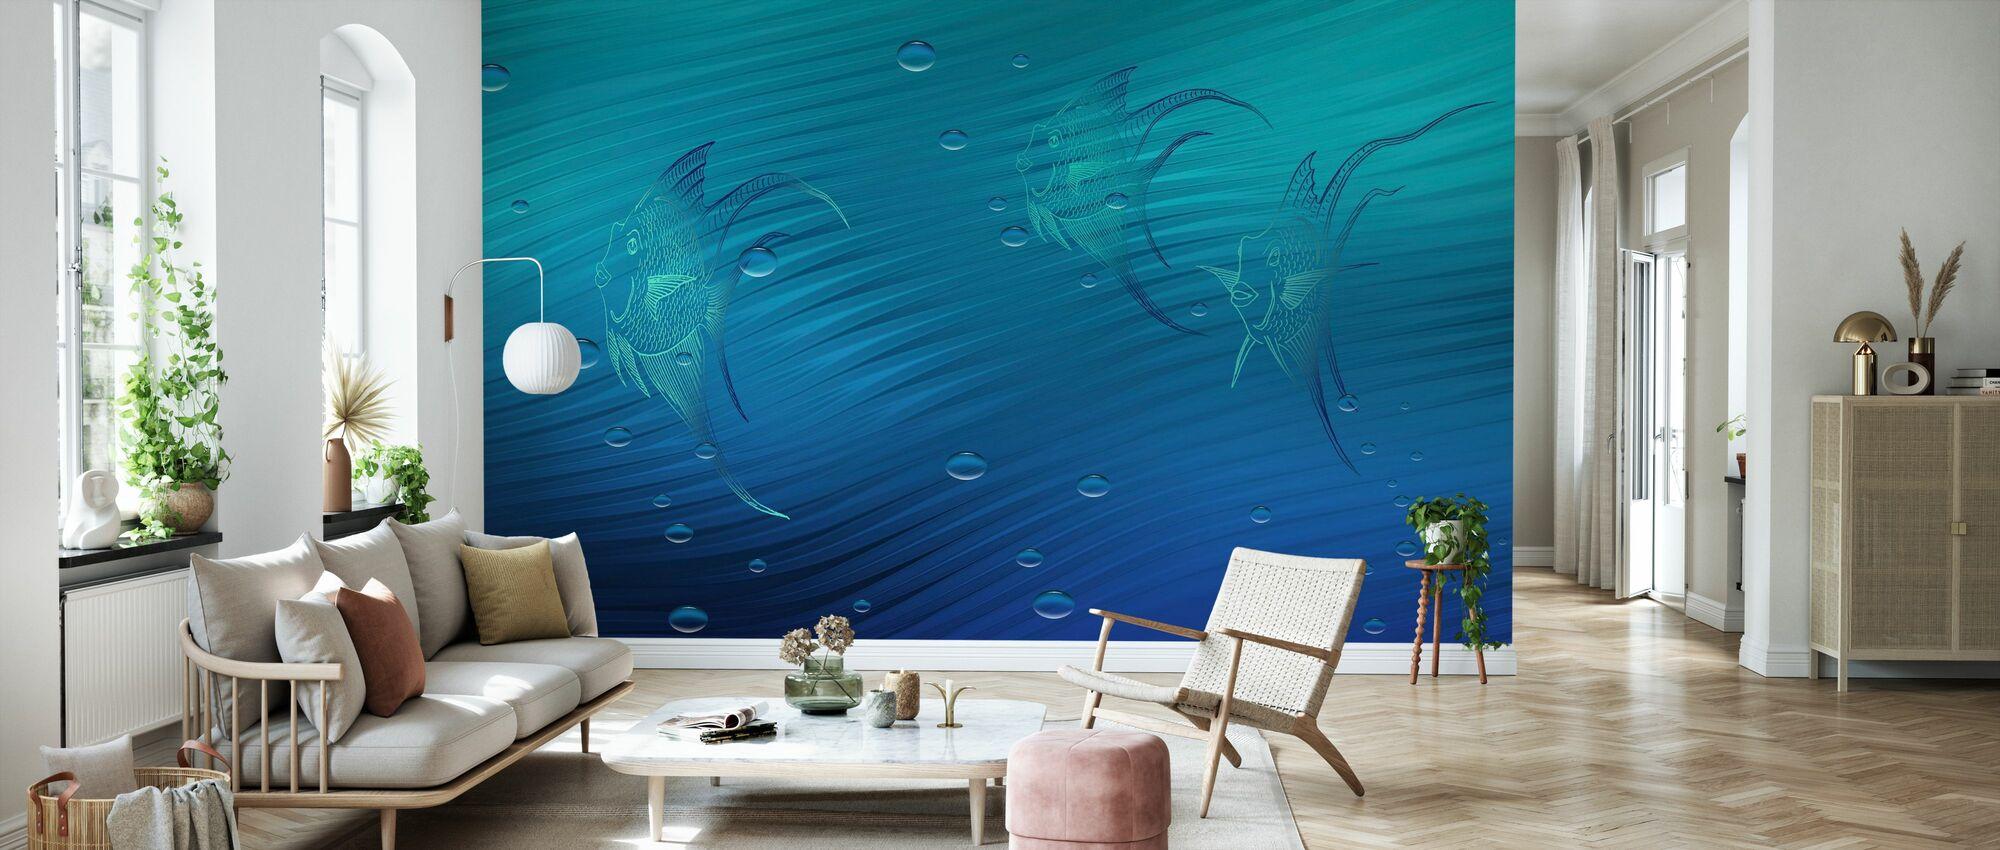 Blue Waters - Wallpaper - Living Room